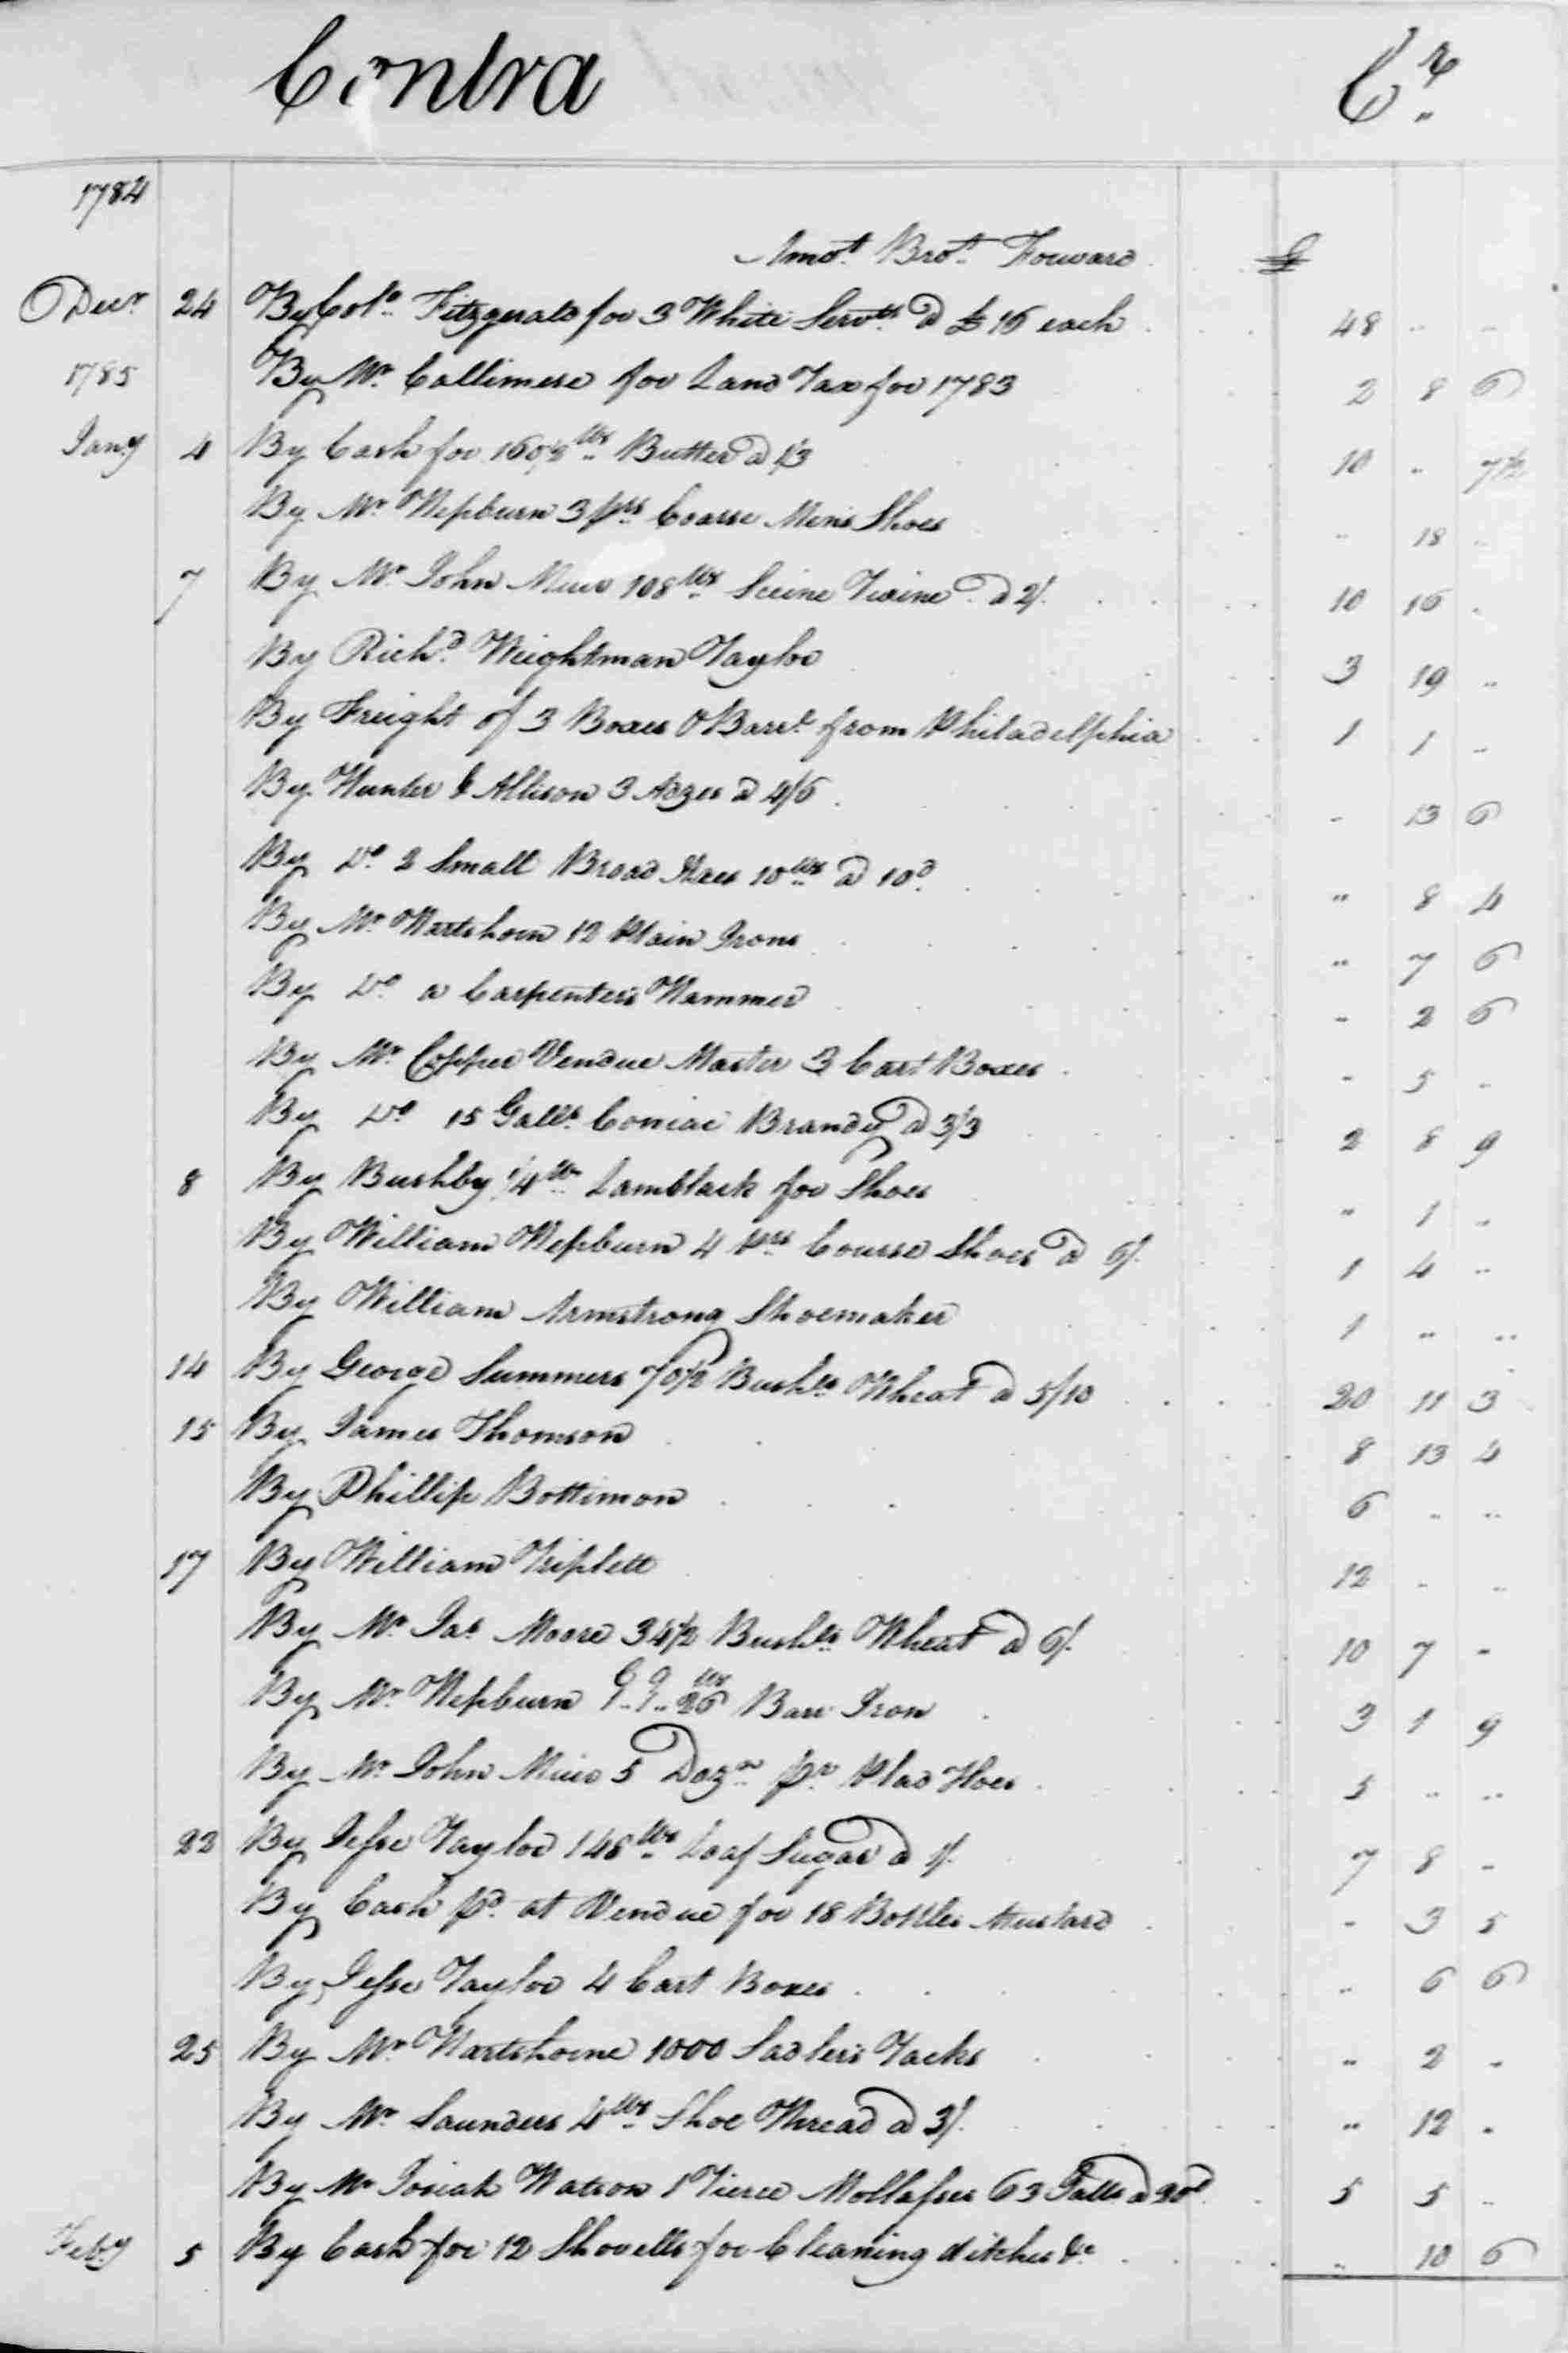 Ledger B, folio 184, right side